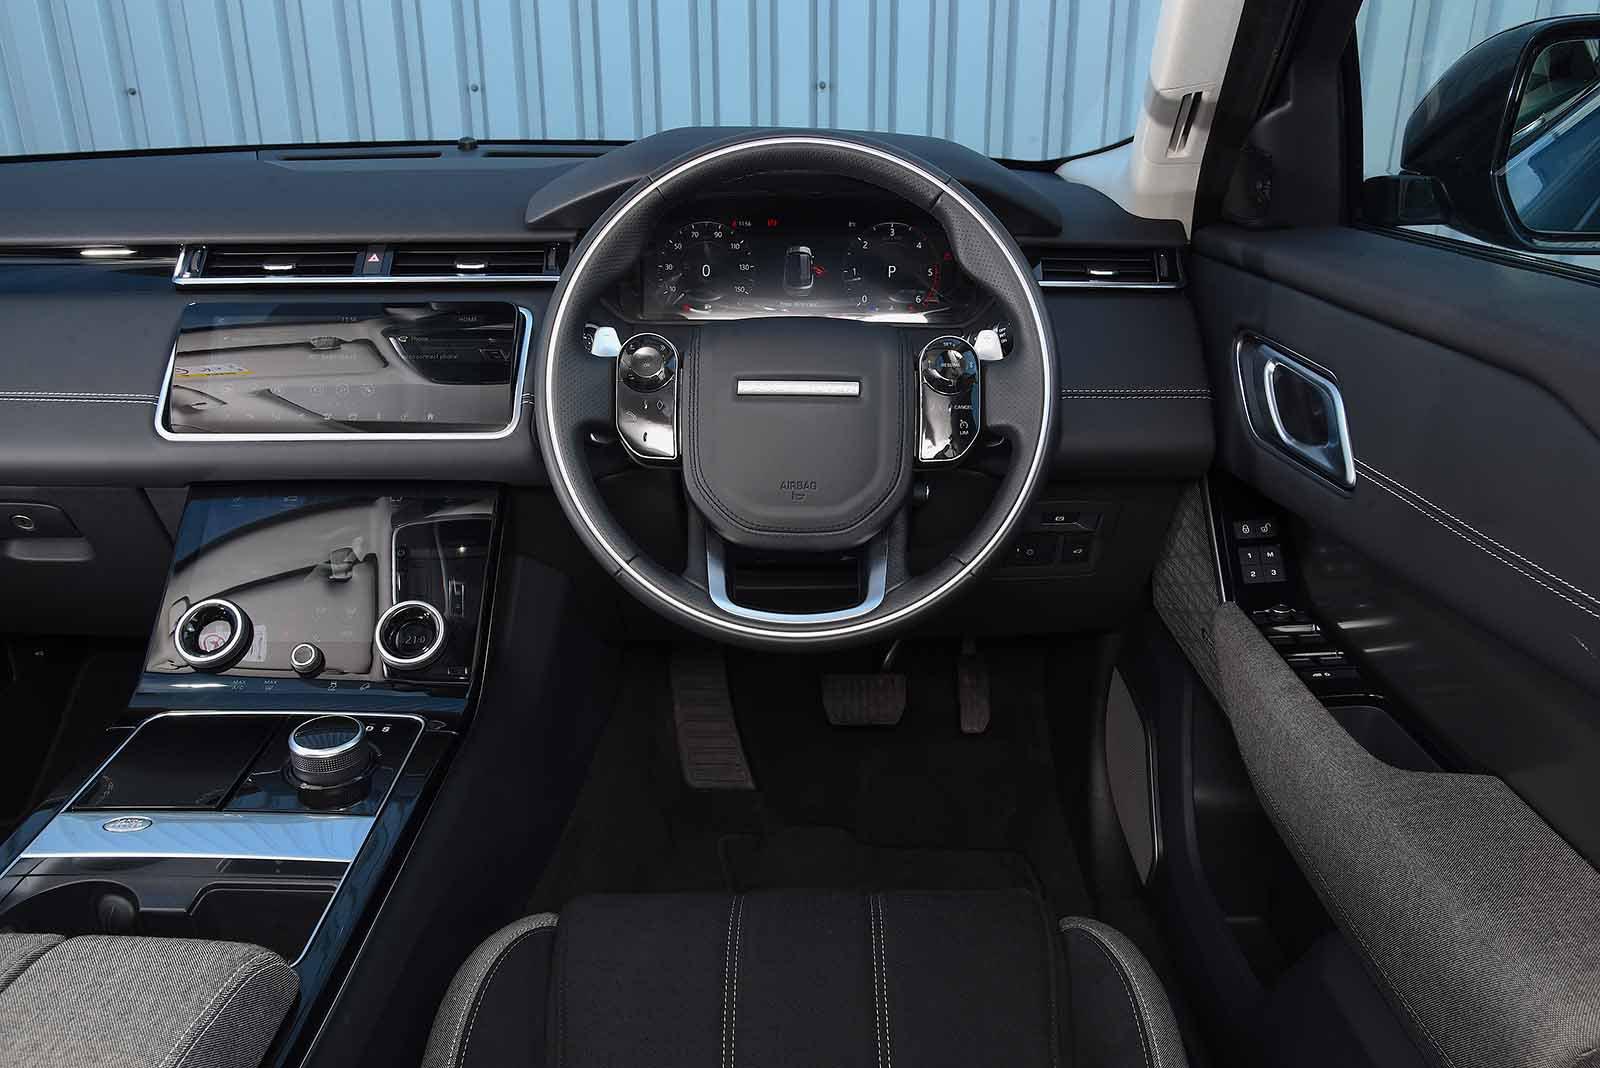 Land Rover Range Rover Velar 2019 RHD dashboard